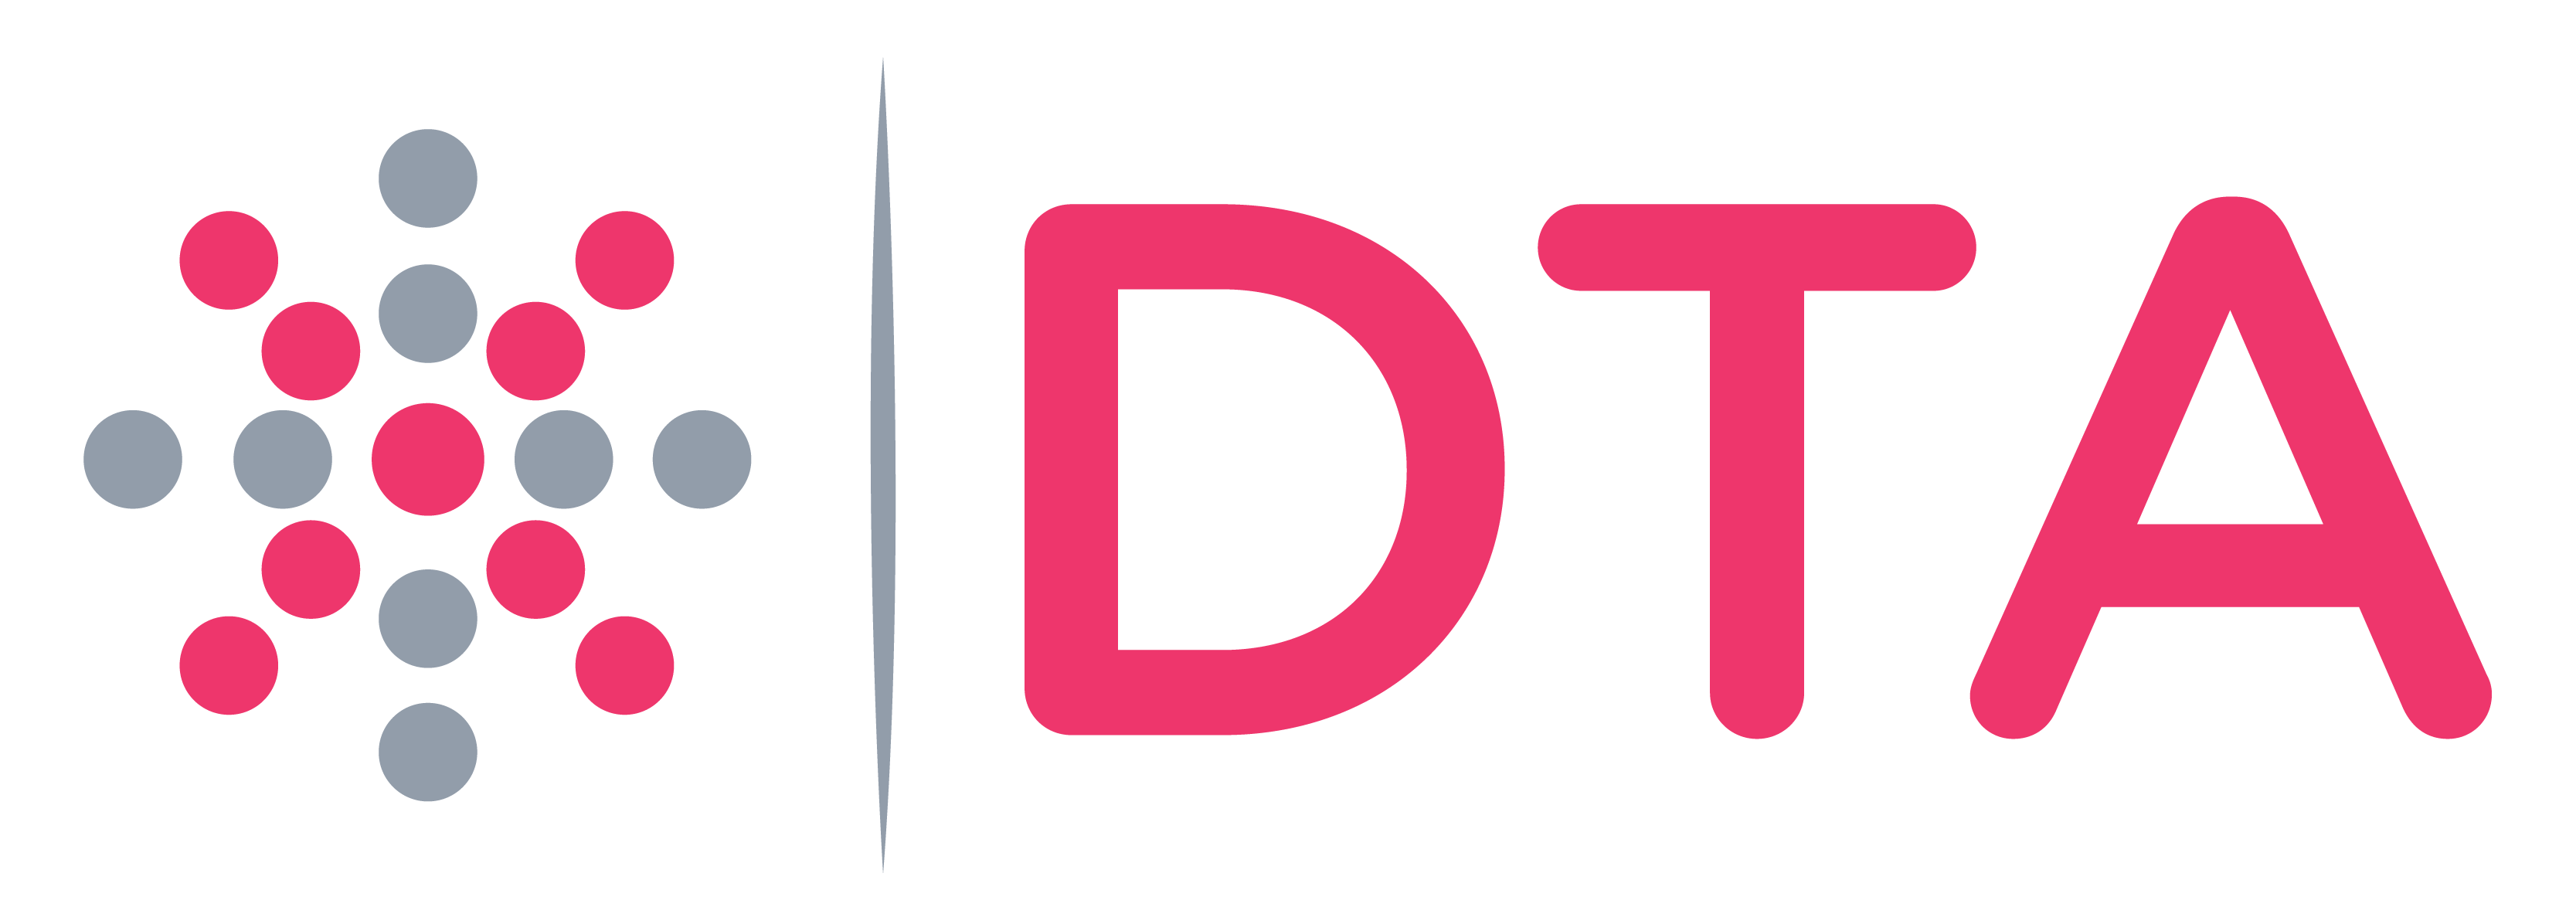 Disruptive Technology Advisers LLC logo